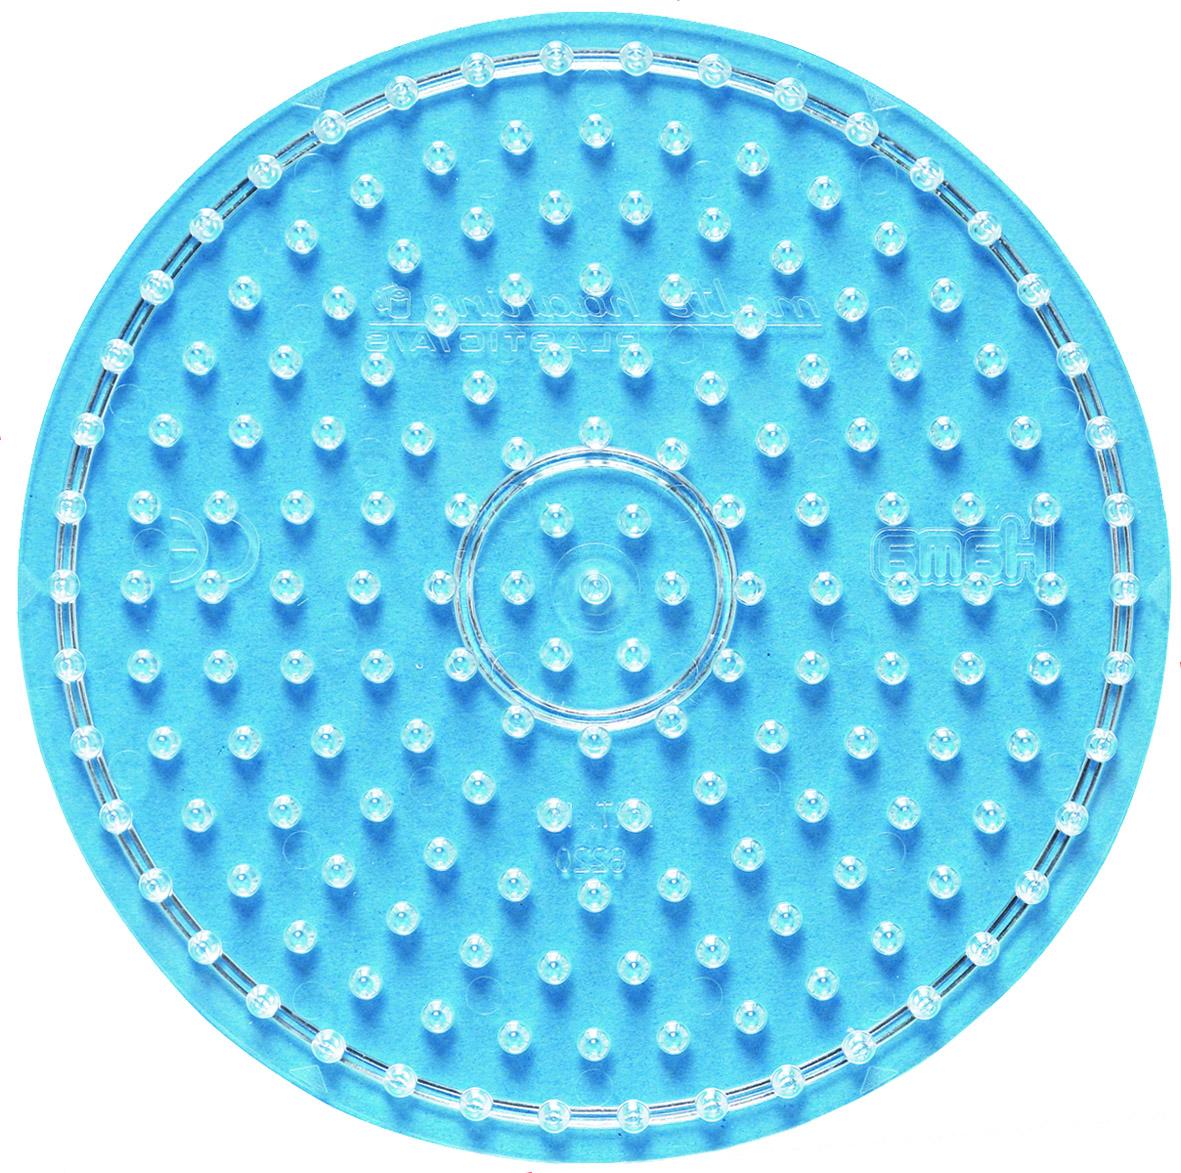 Round Peg Board for Hama Maxi Beads 8220